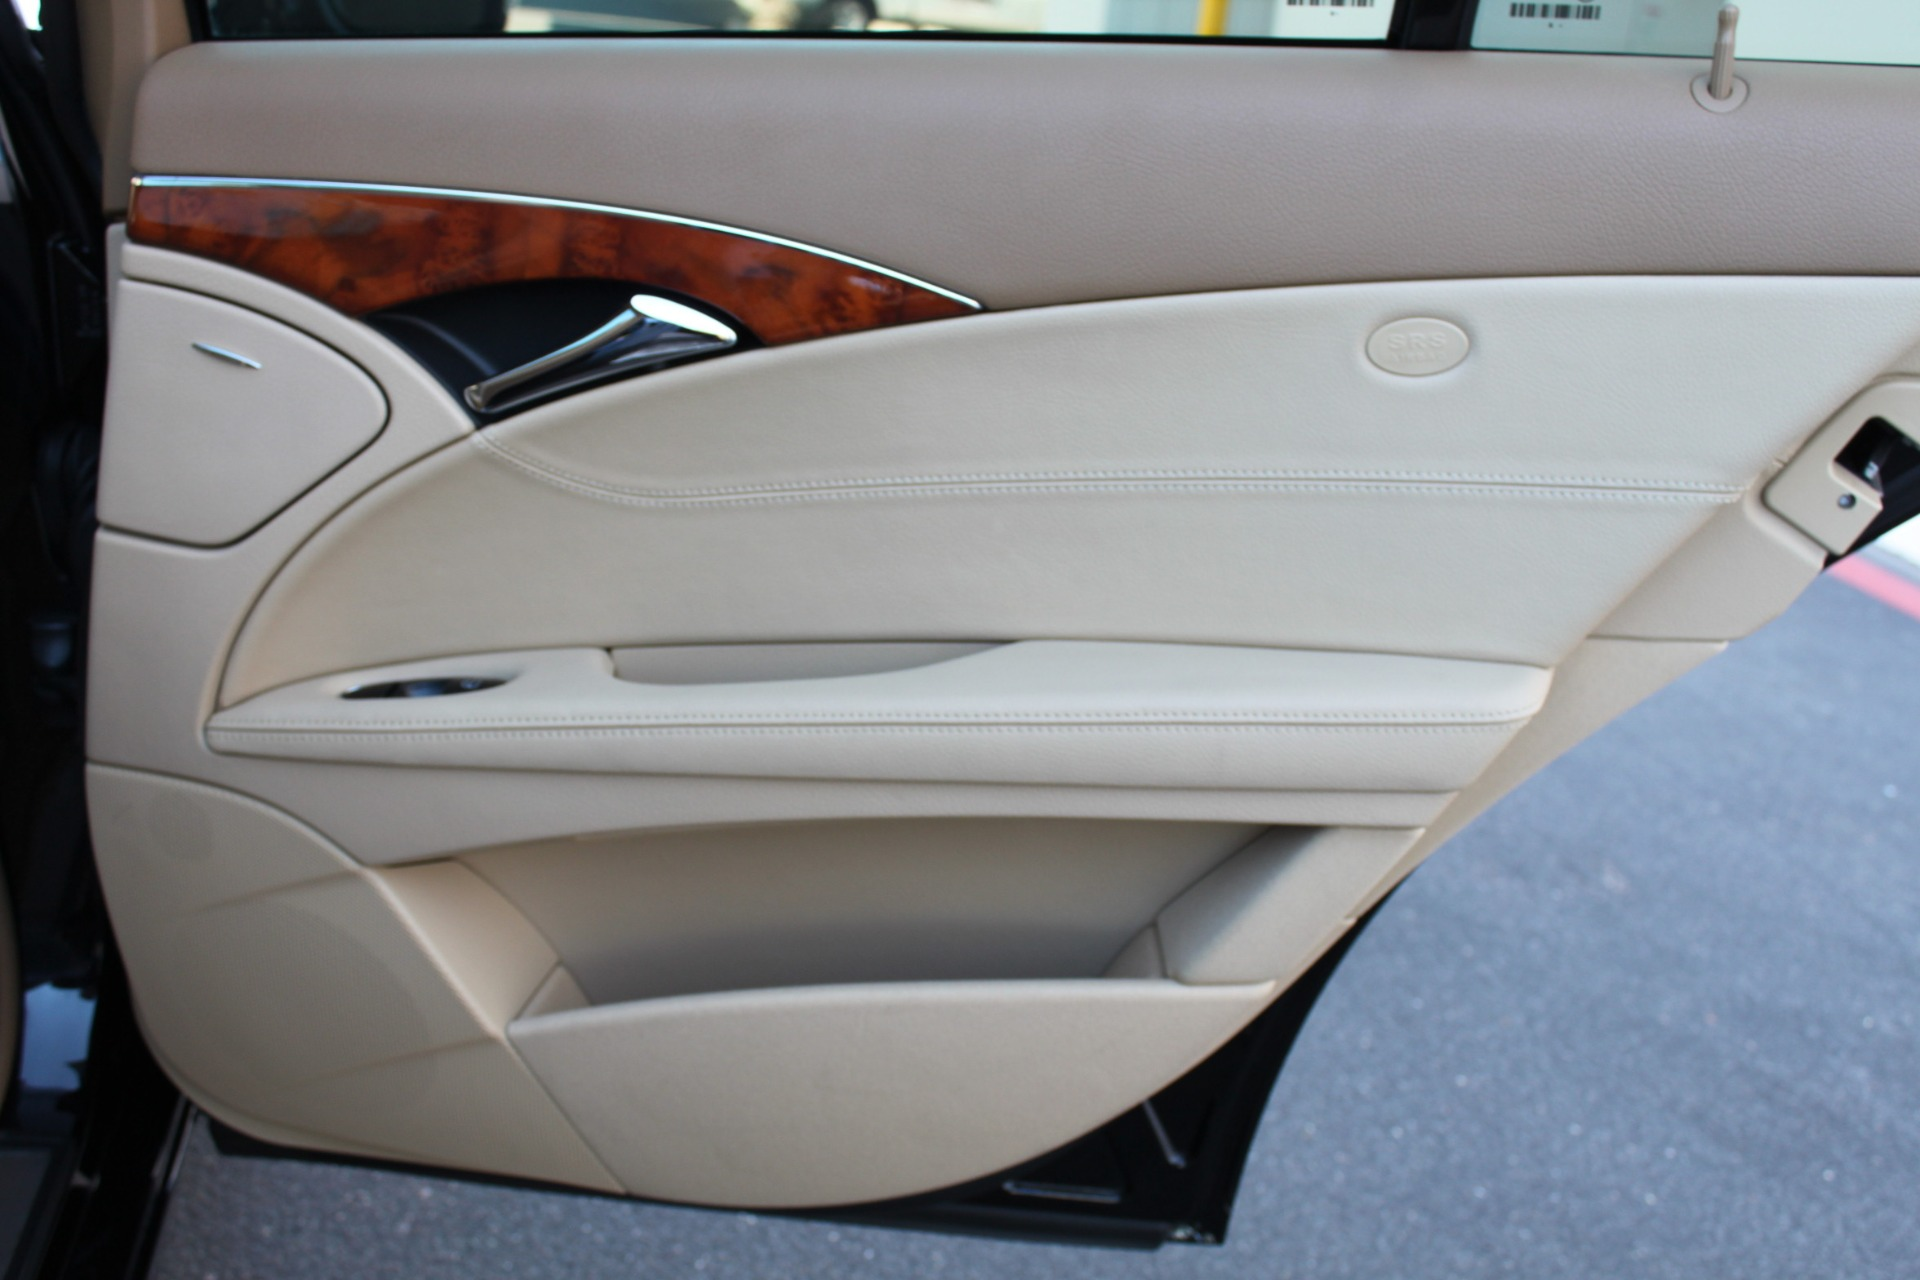 Used-2009-Mercedes-Benz-E-Class-E320-30L-BlueTEC-Chalenger